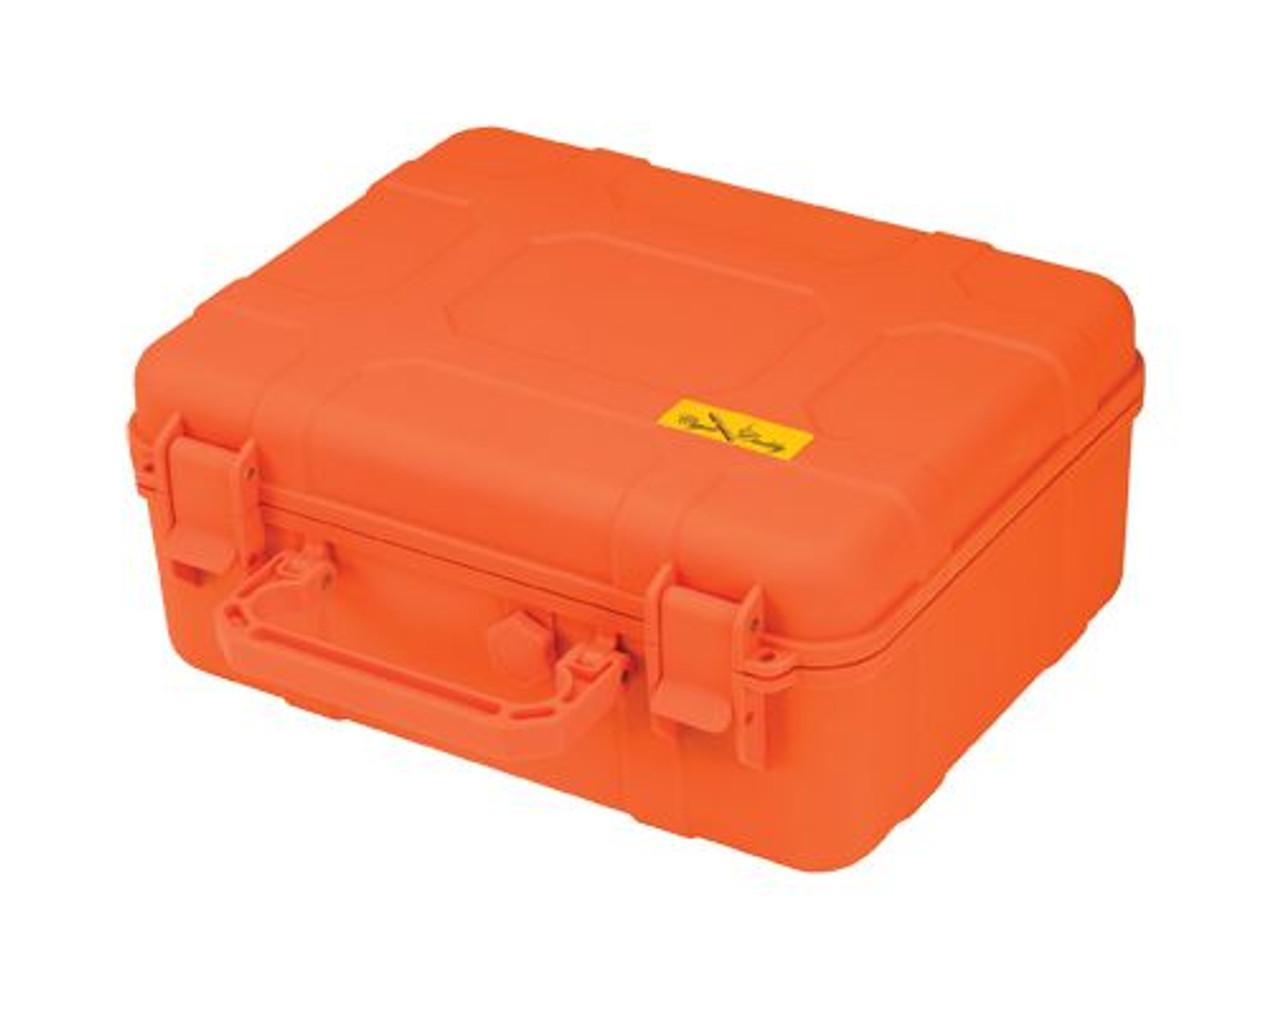 Cigar Caddy 40 Count Travel Humidor- Orange